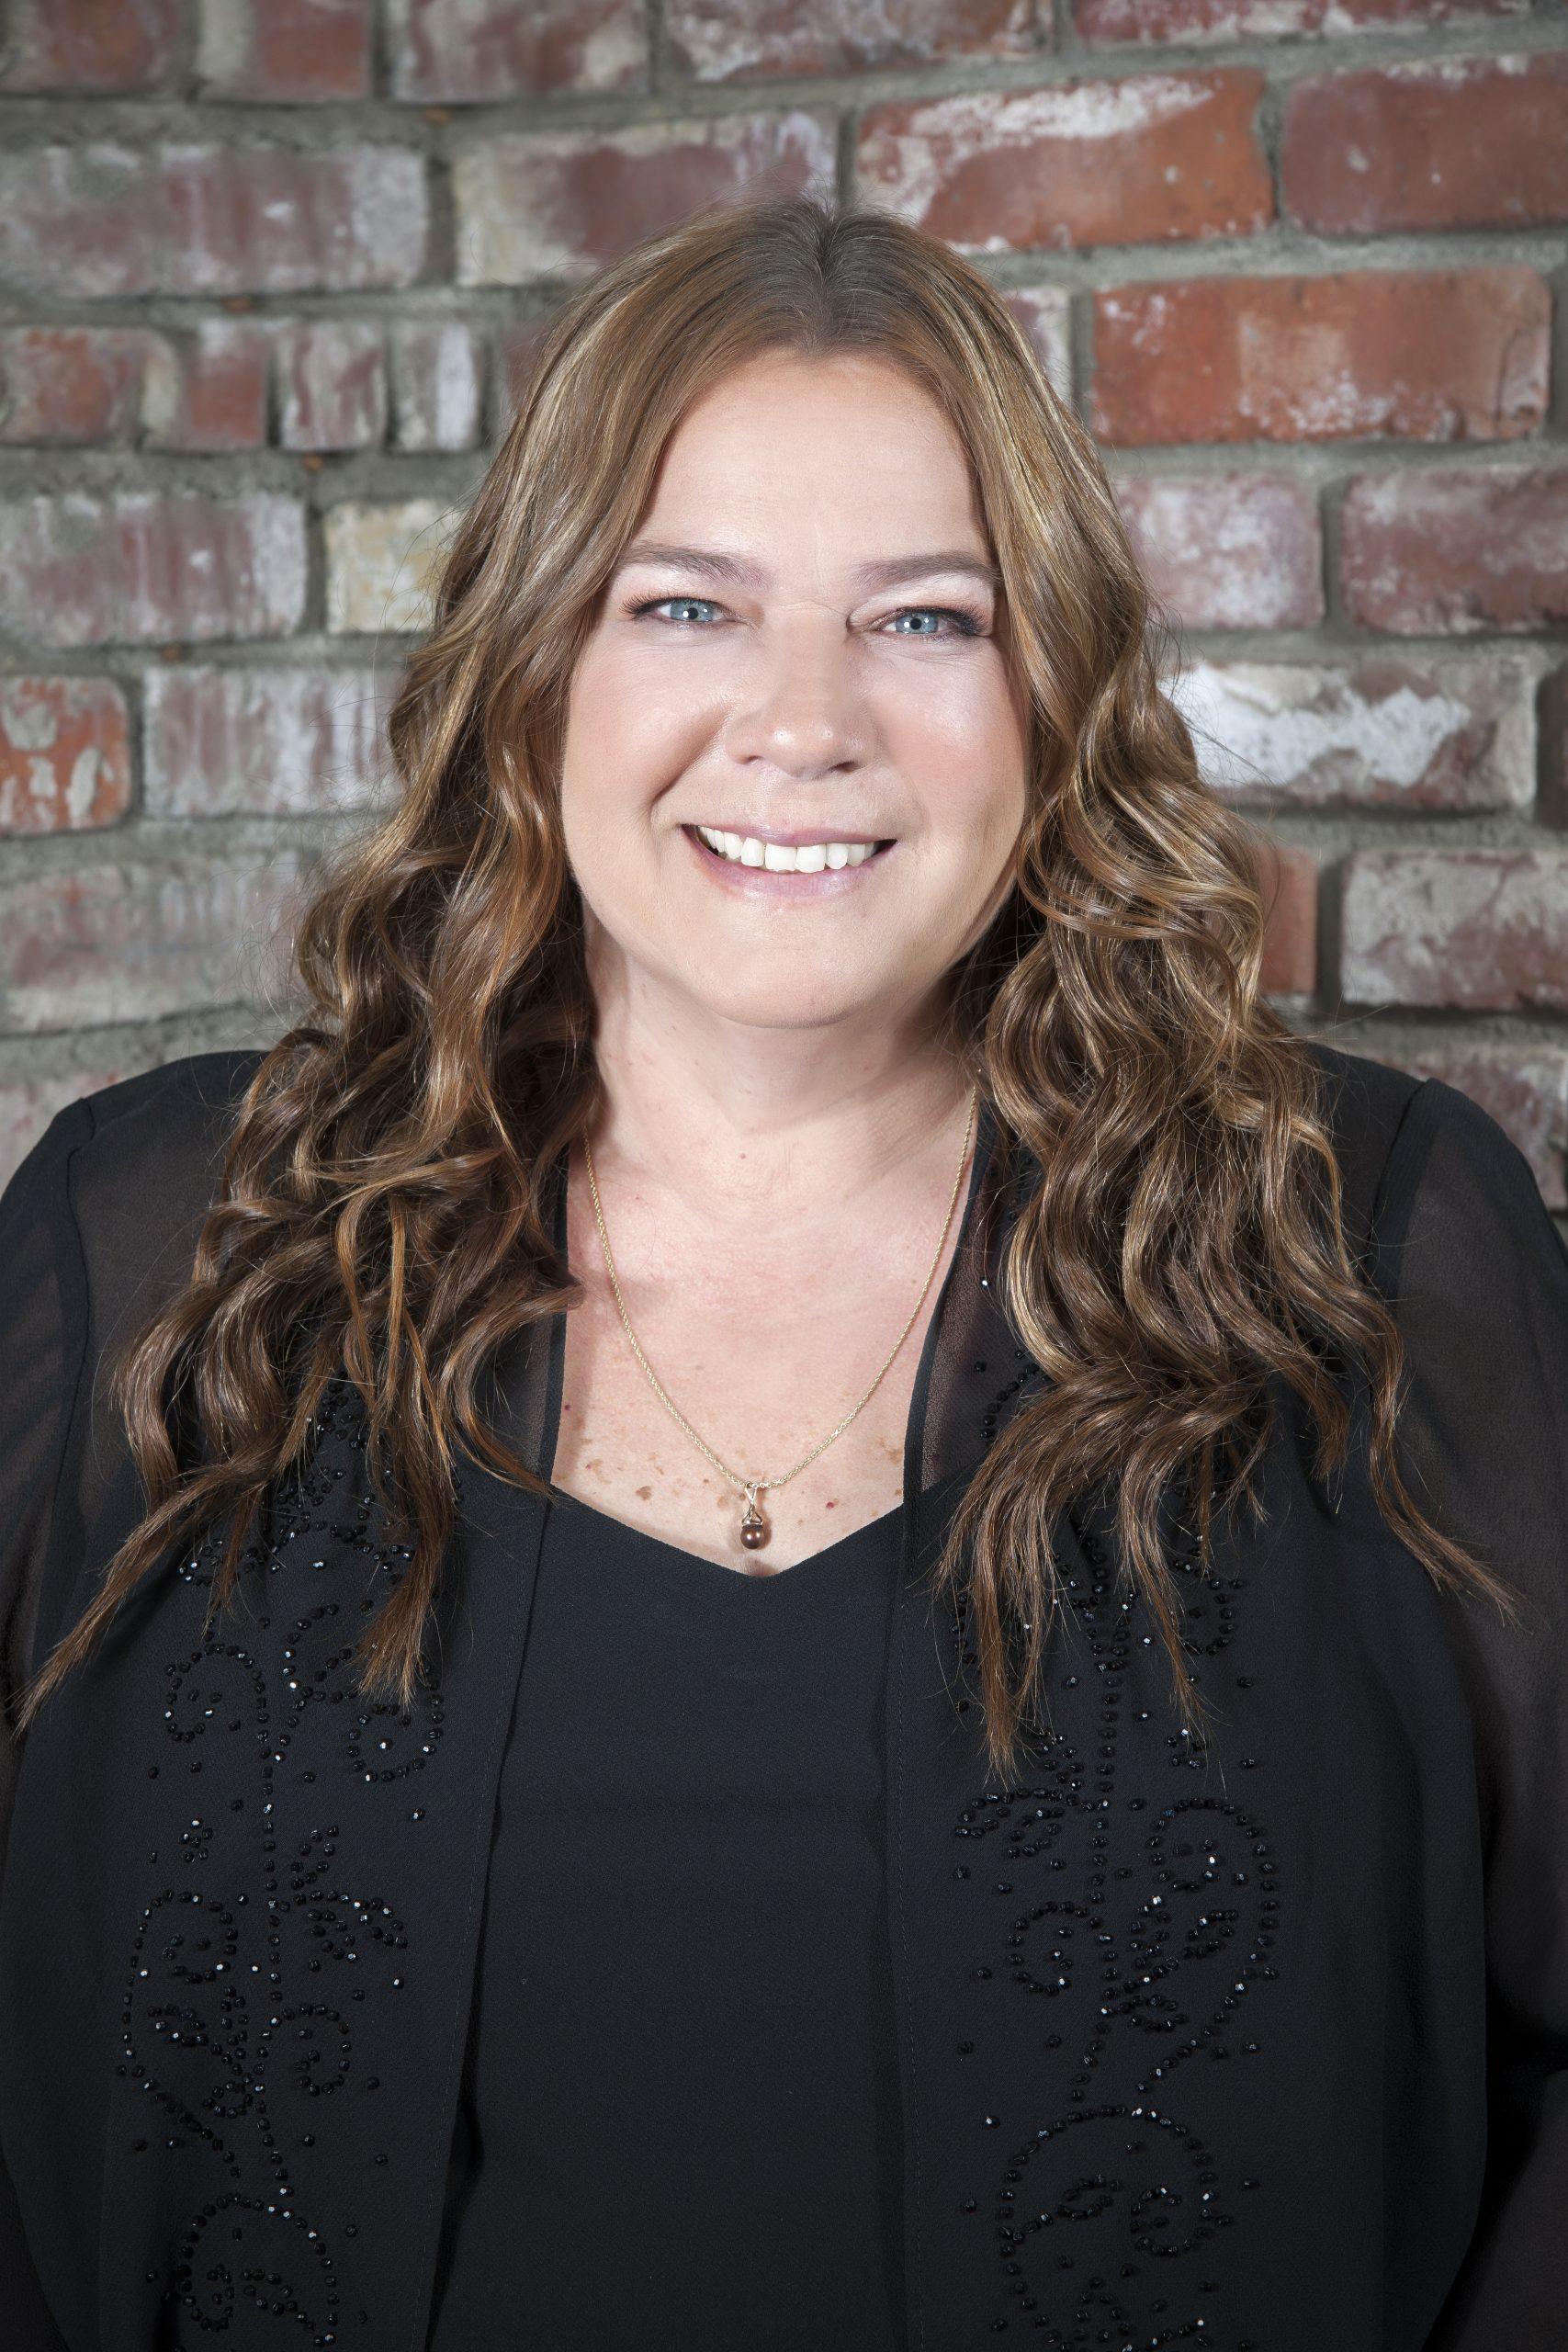 Deanna Brown